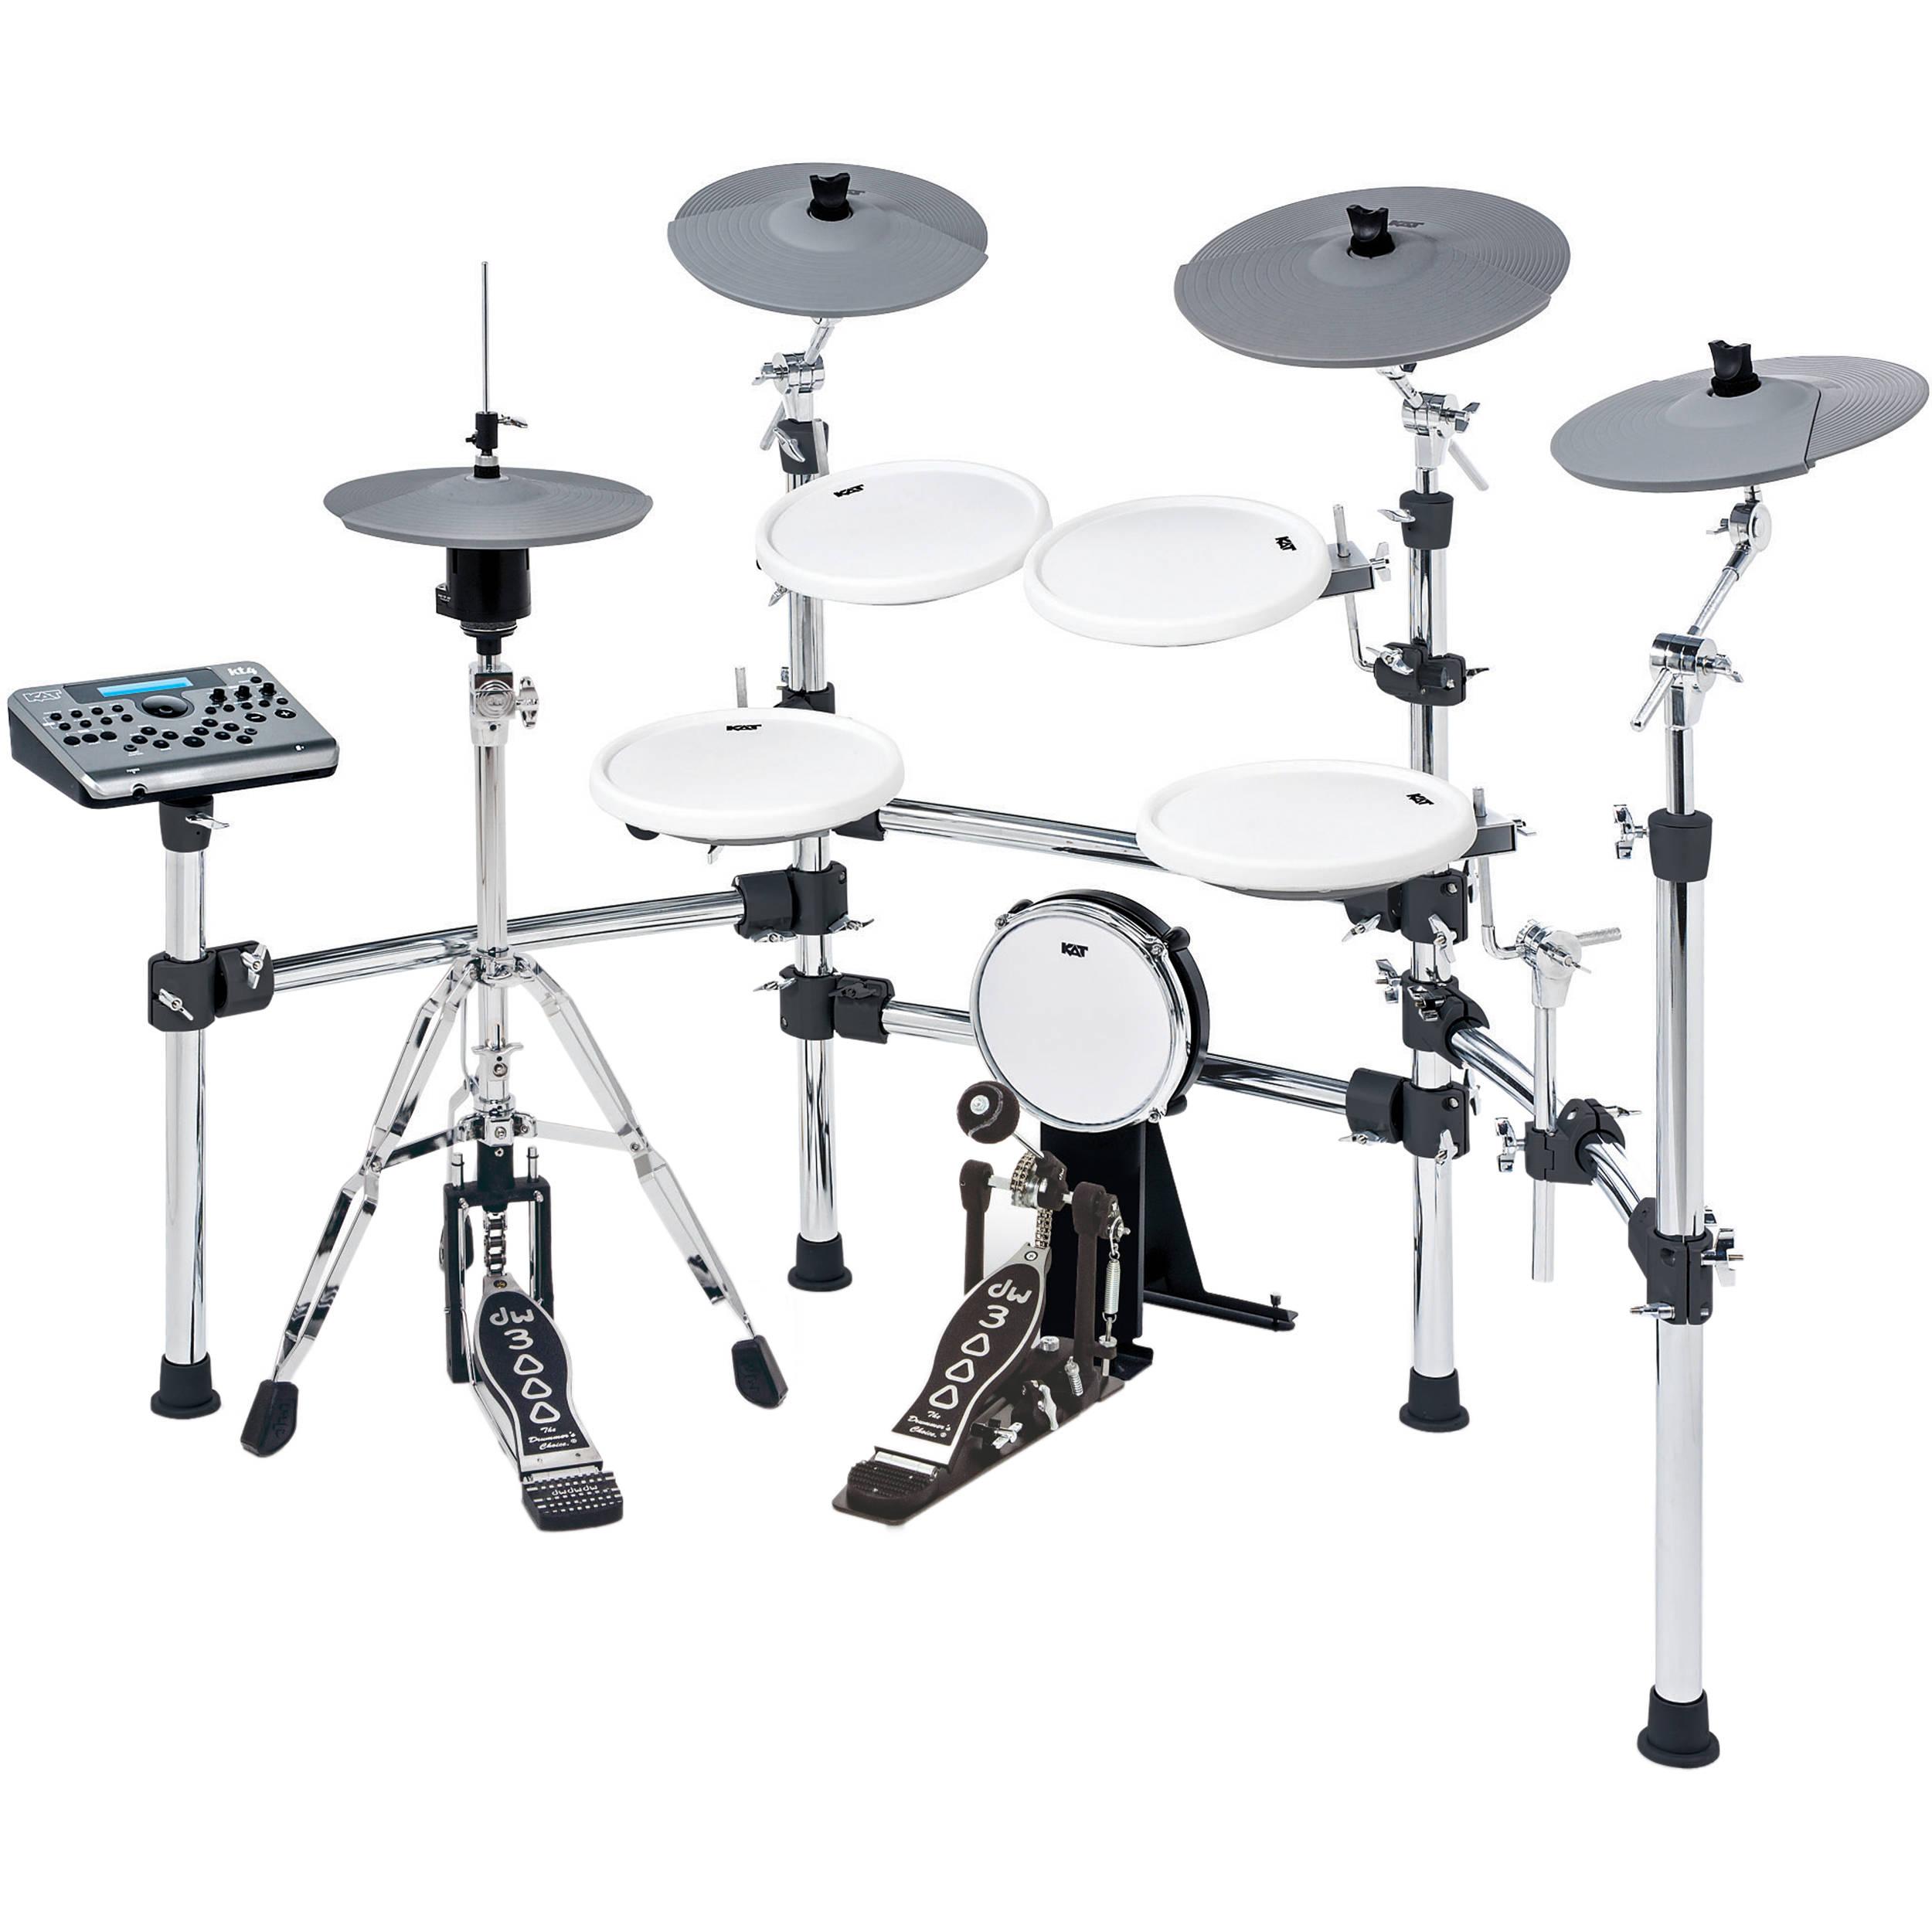 KAT KT4 5-Piece Advanced Electronic Drum Kit KT4-US B&H Photo